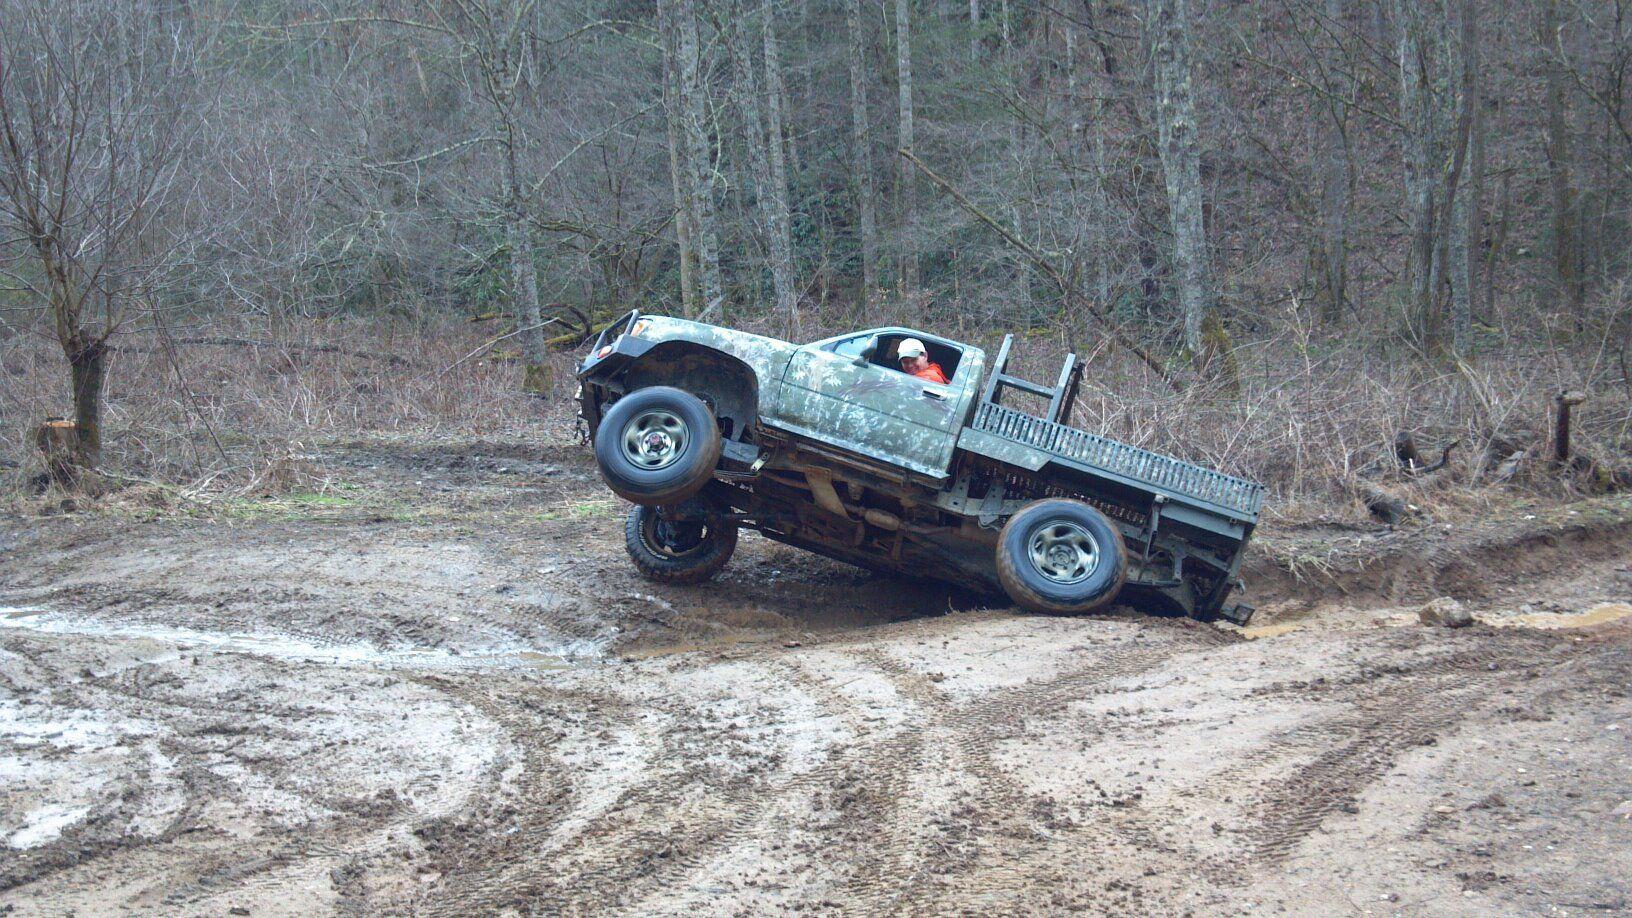 Hurricane Creek In Nc Jeep North Carolina Toy Car